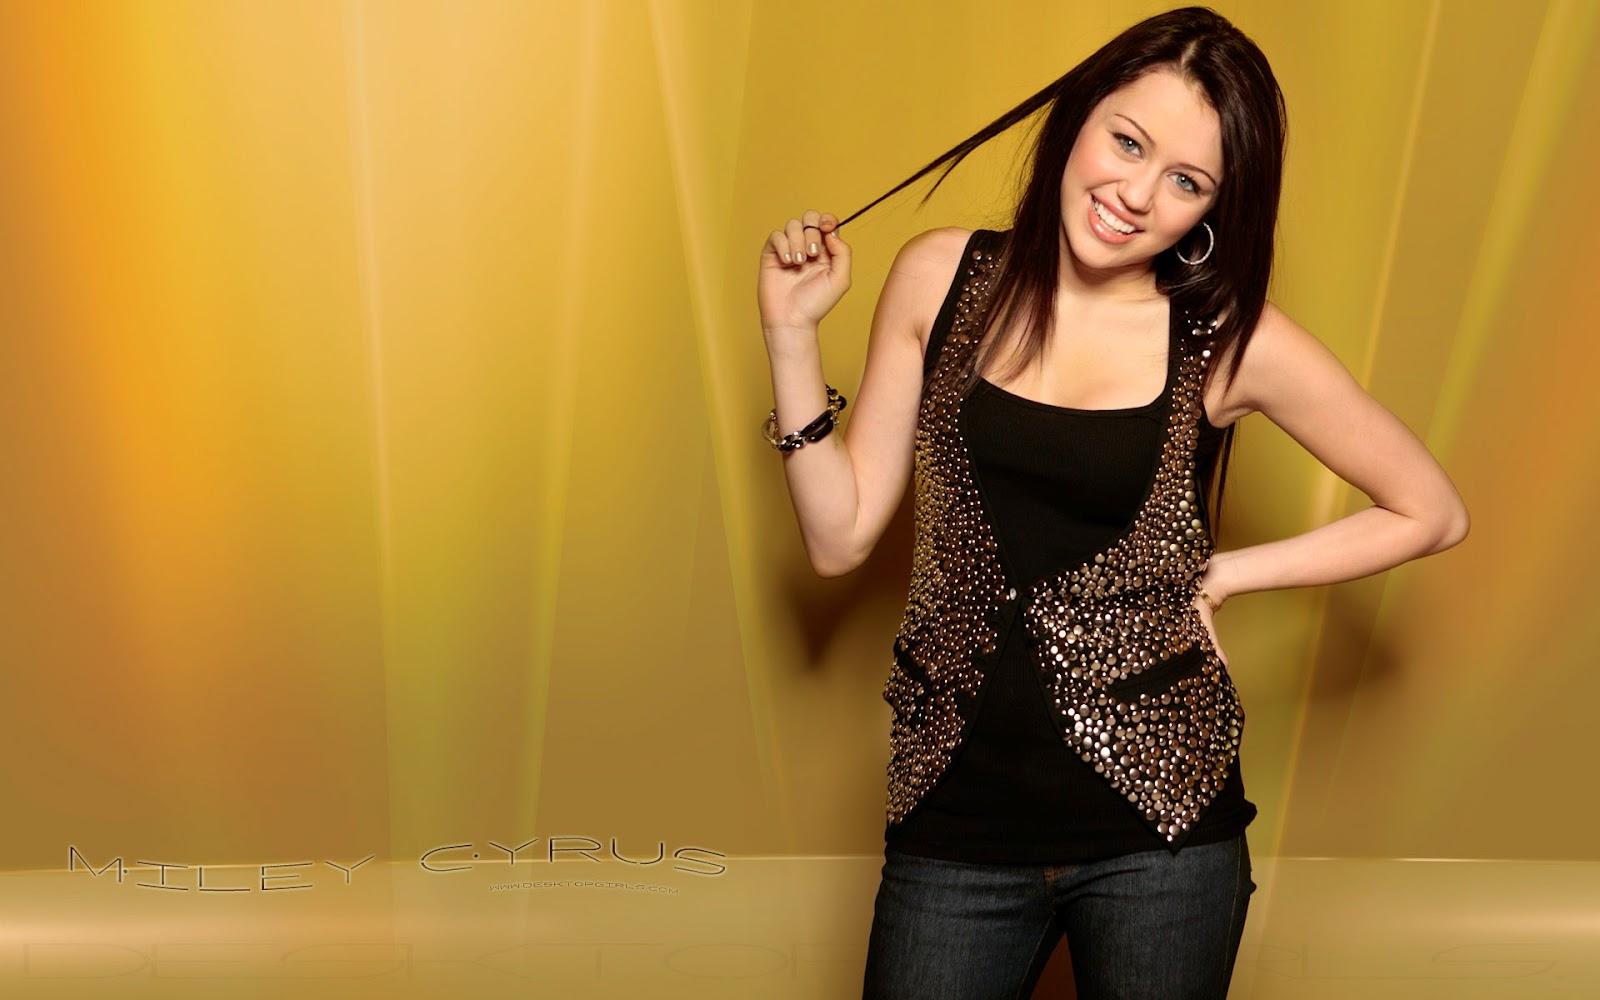 http://4.bp.blogspot.com/-vJPvrwUiYYc/UAacaYMQweI/AAAAAAAAC_g/lTDaxlnUJ-8/s1600/Miley_Cyrus.jpg